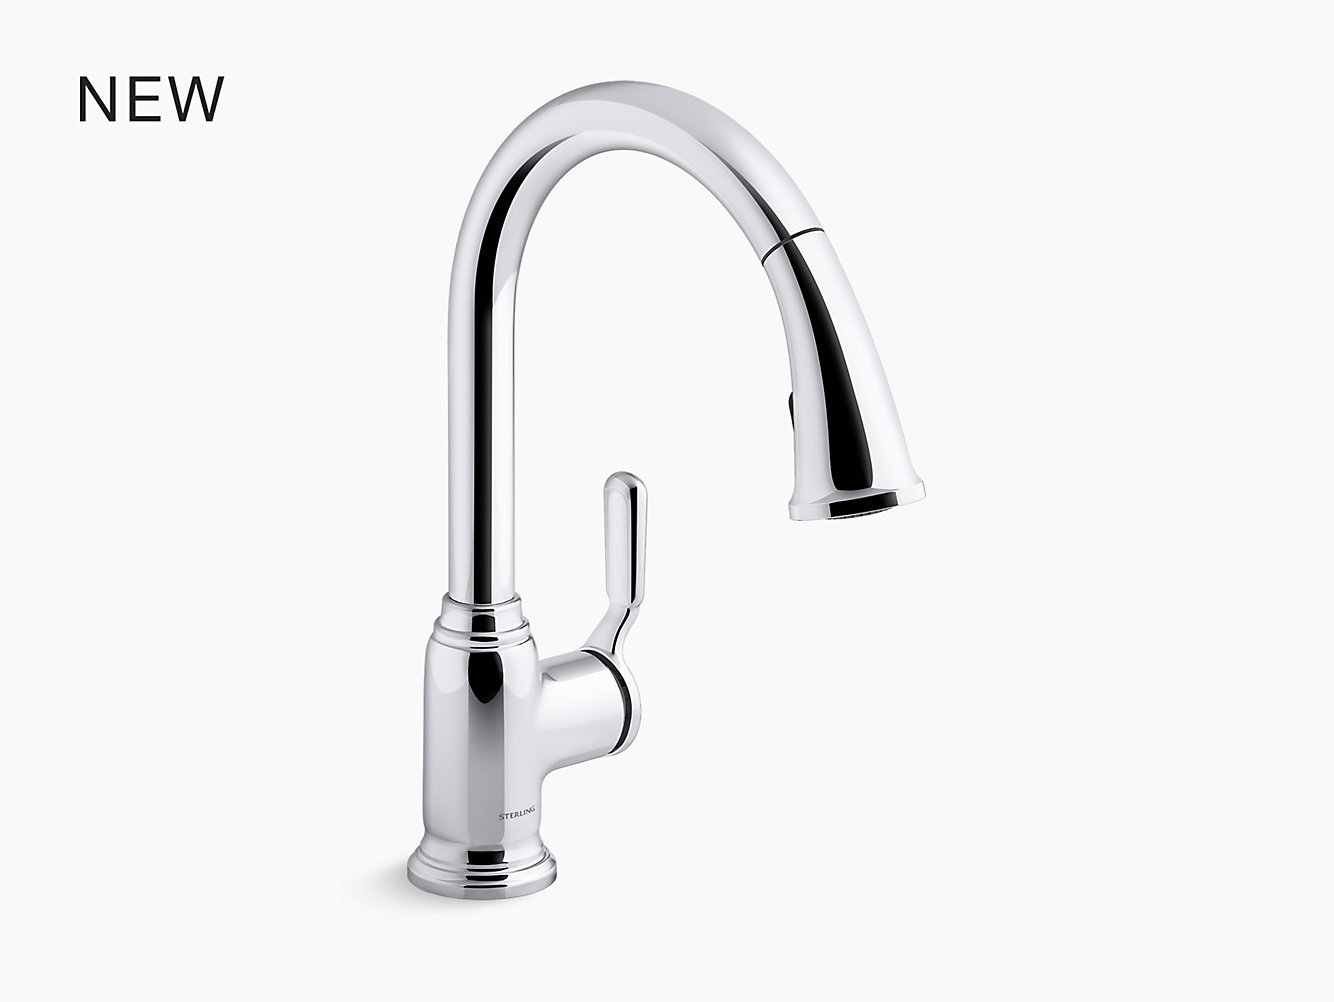 Ludington Pull Down Single Handle Kitchen Faucet 24272 Cp Pull Down Single Handle Kitchen Faucet 24272 Sterling